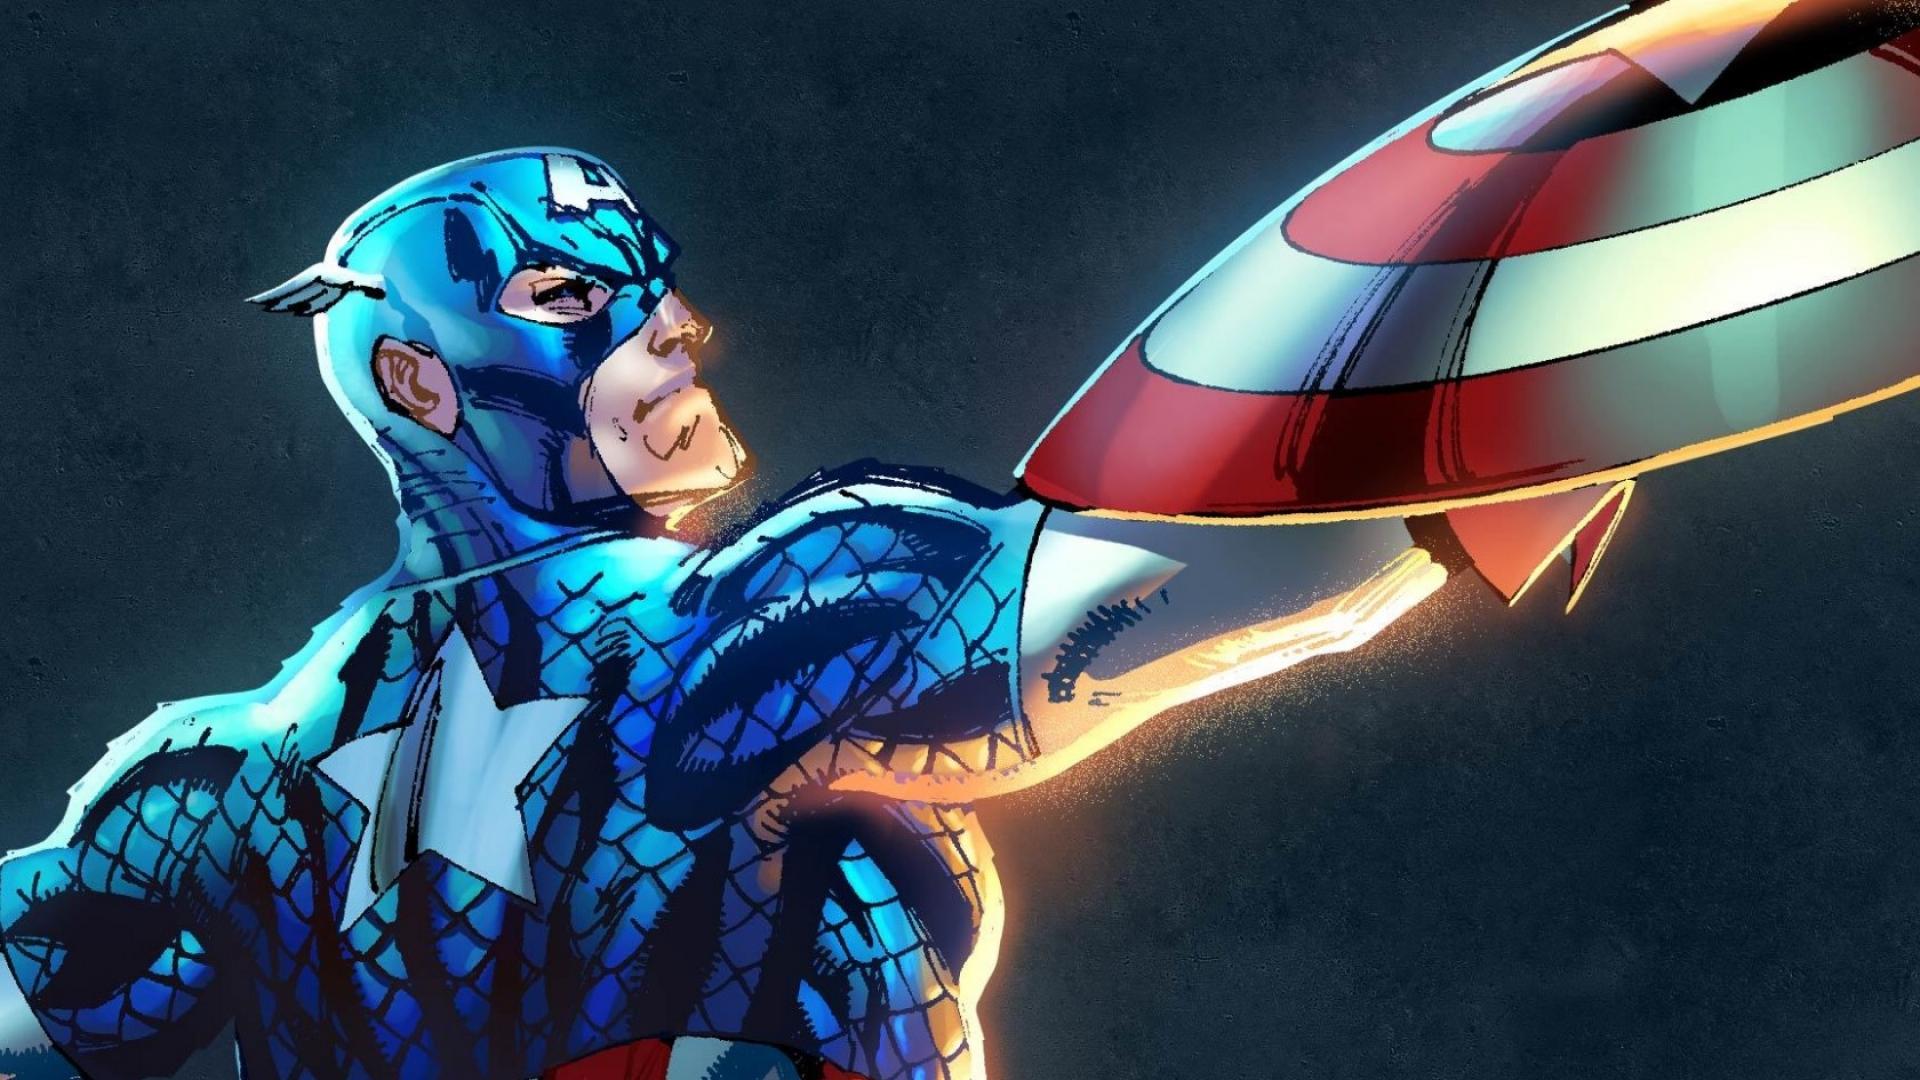 Full HD 1080p Captain America Wallpapers HD, Desktop Backgrounds